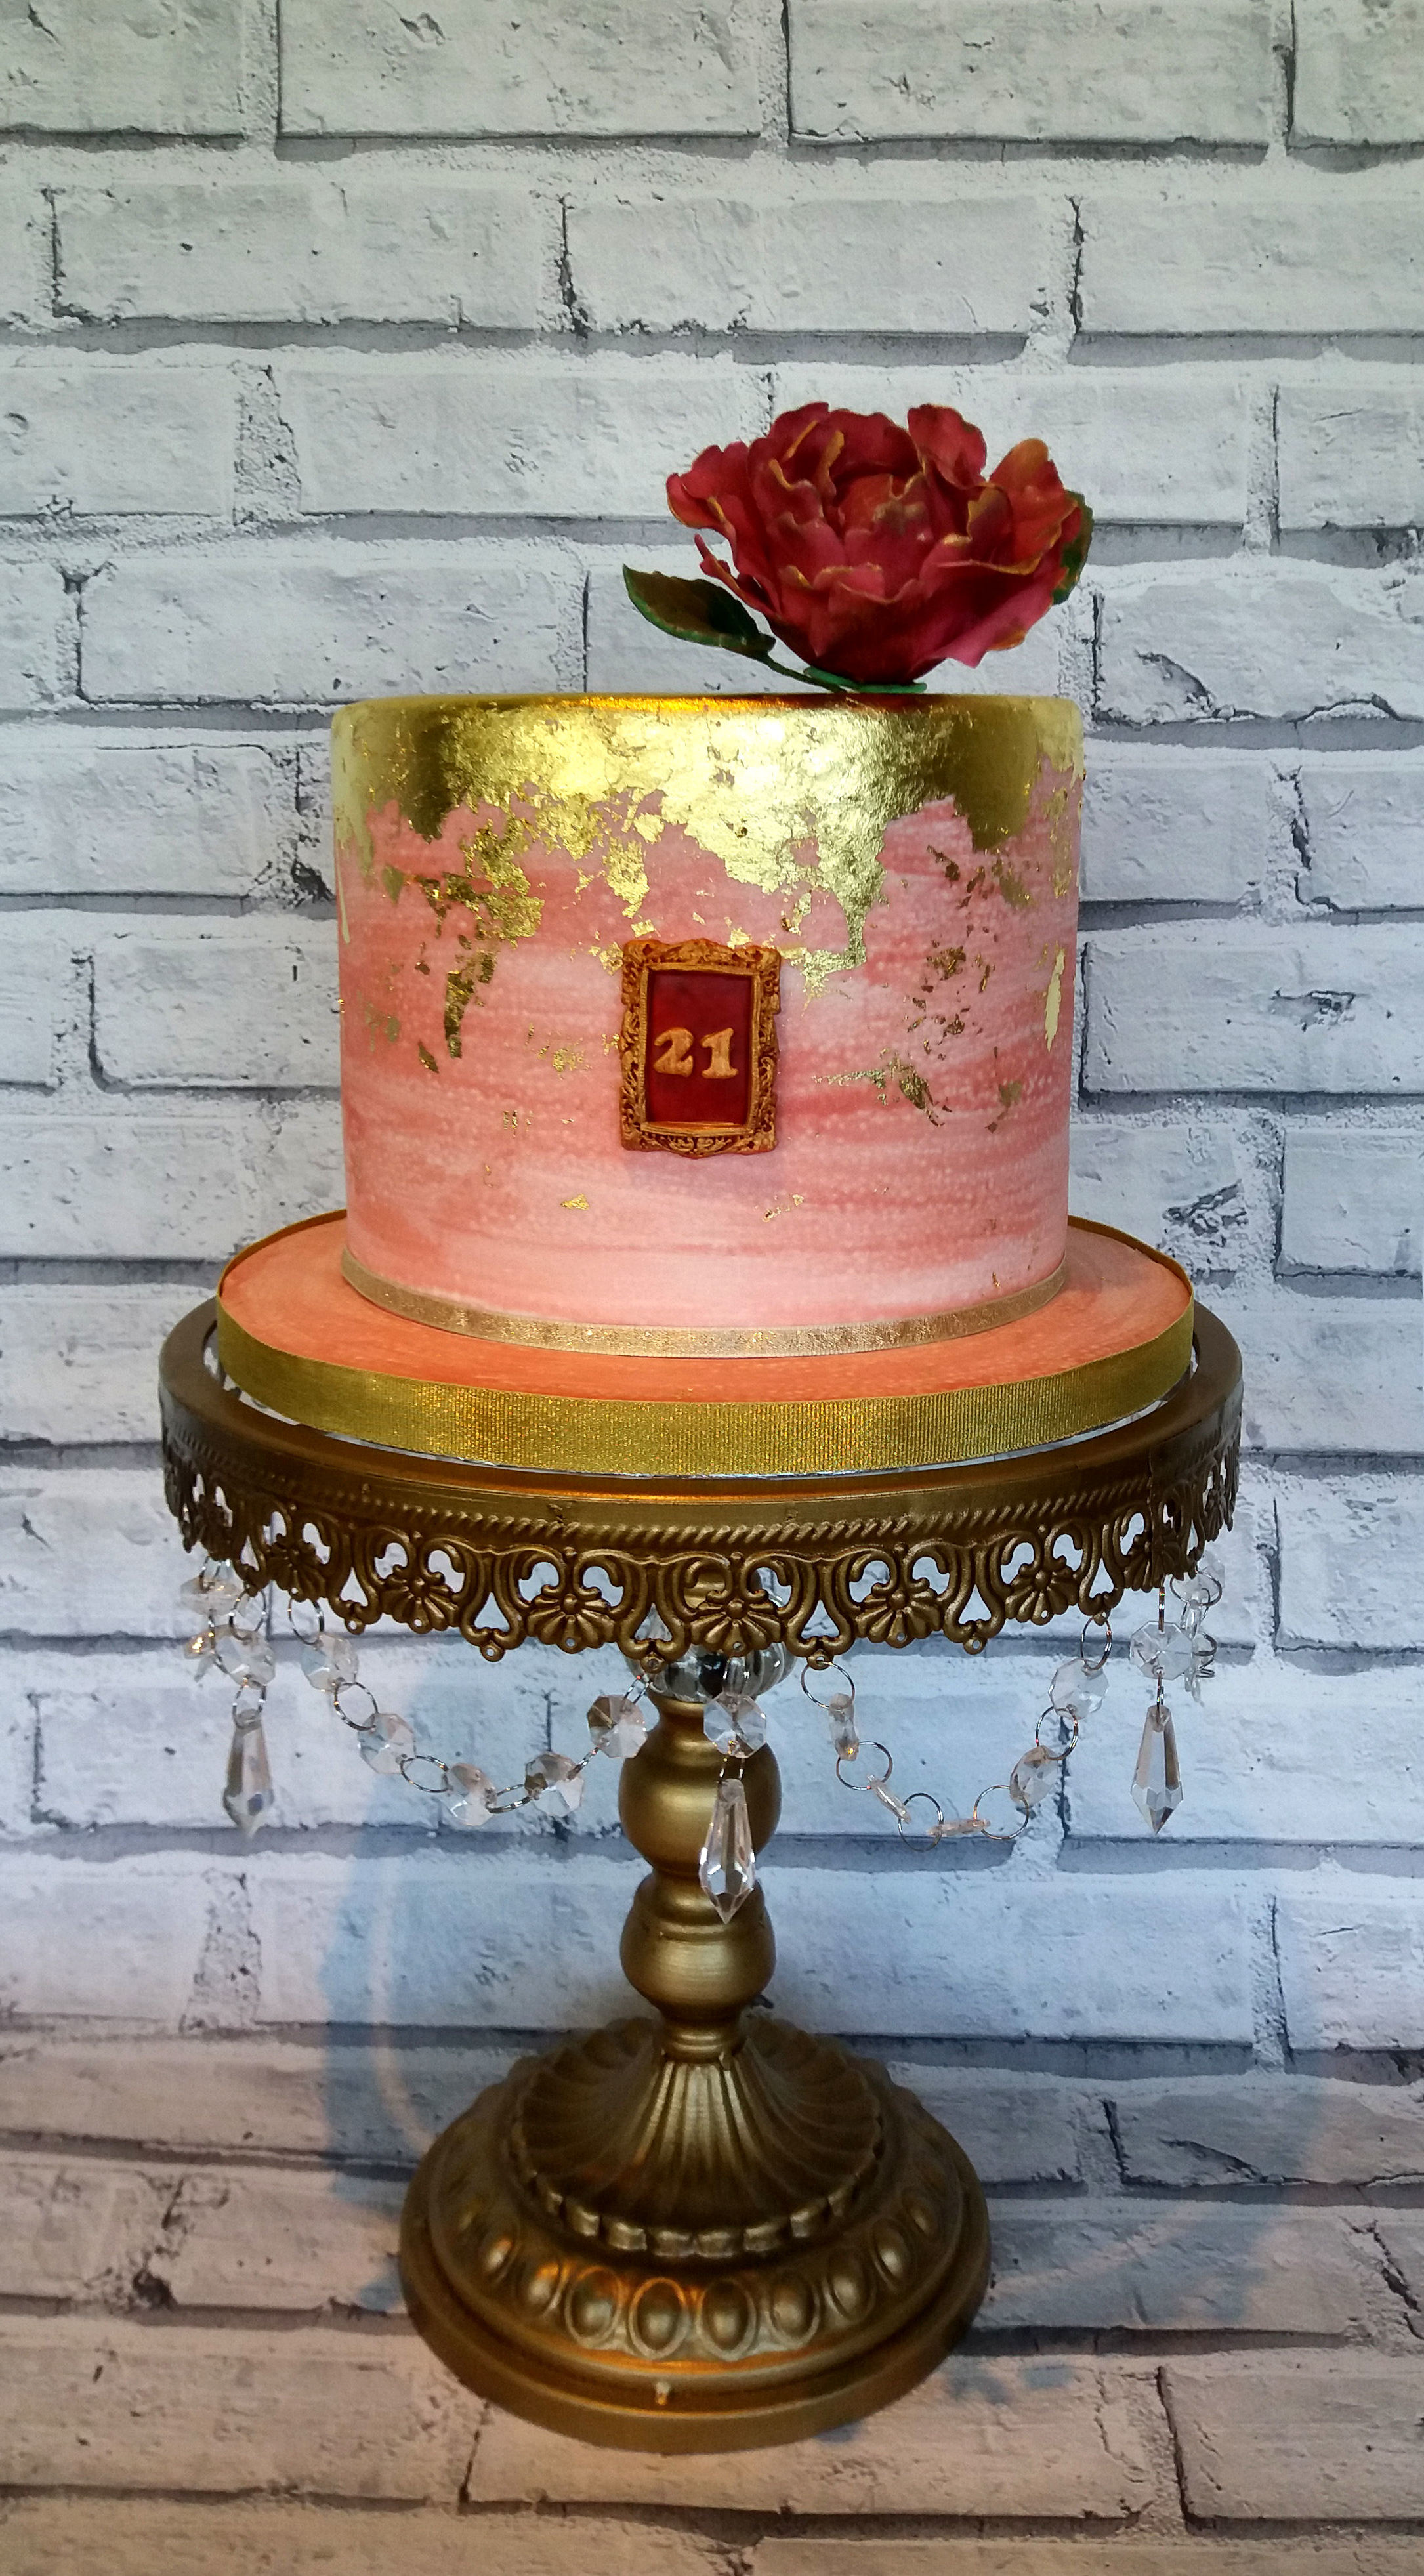 24ct gold cake 1.jpg